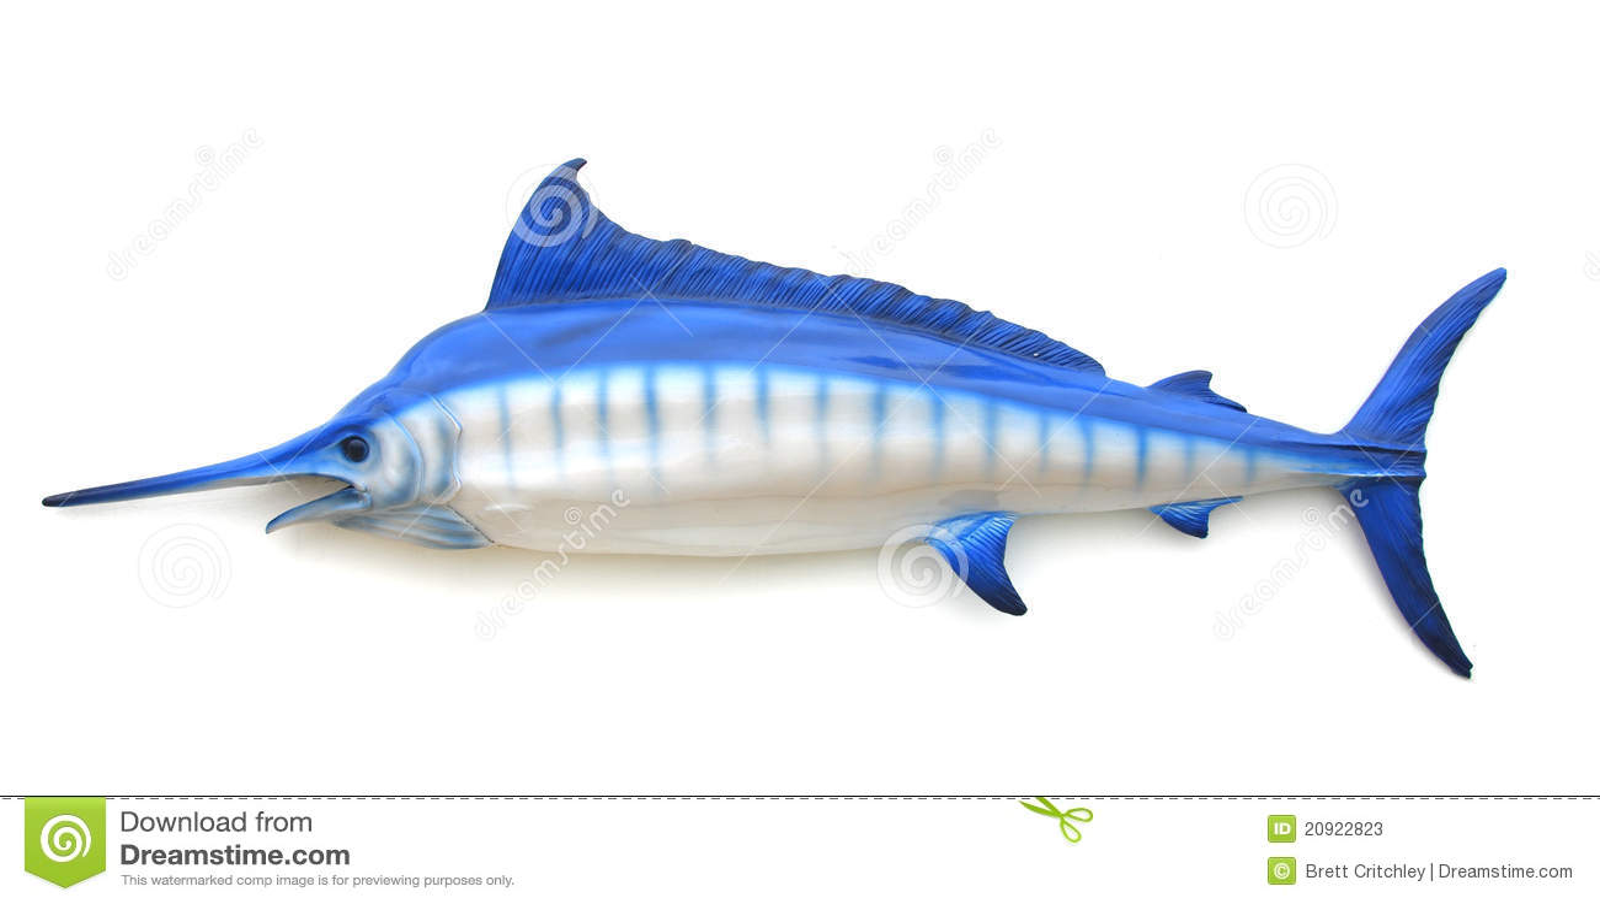 blue swordfish stock photos image 20922823 swordfish clipart bw swordfish clip art free